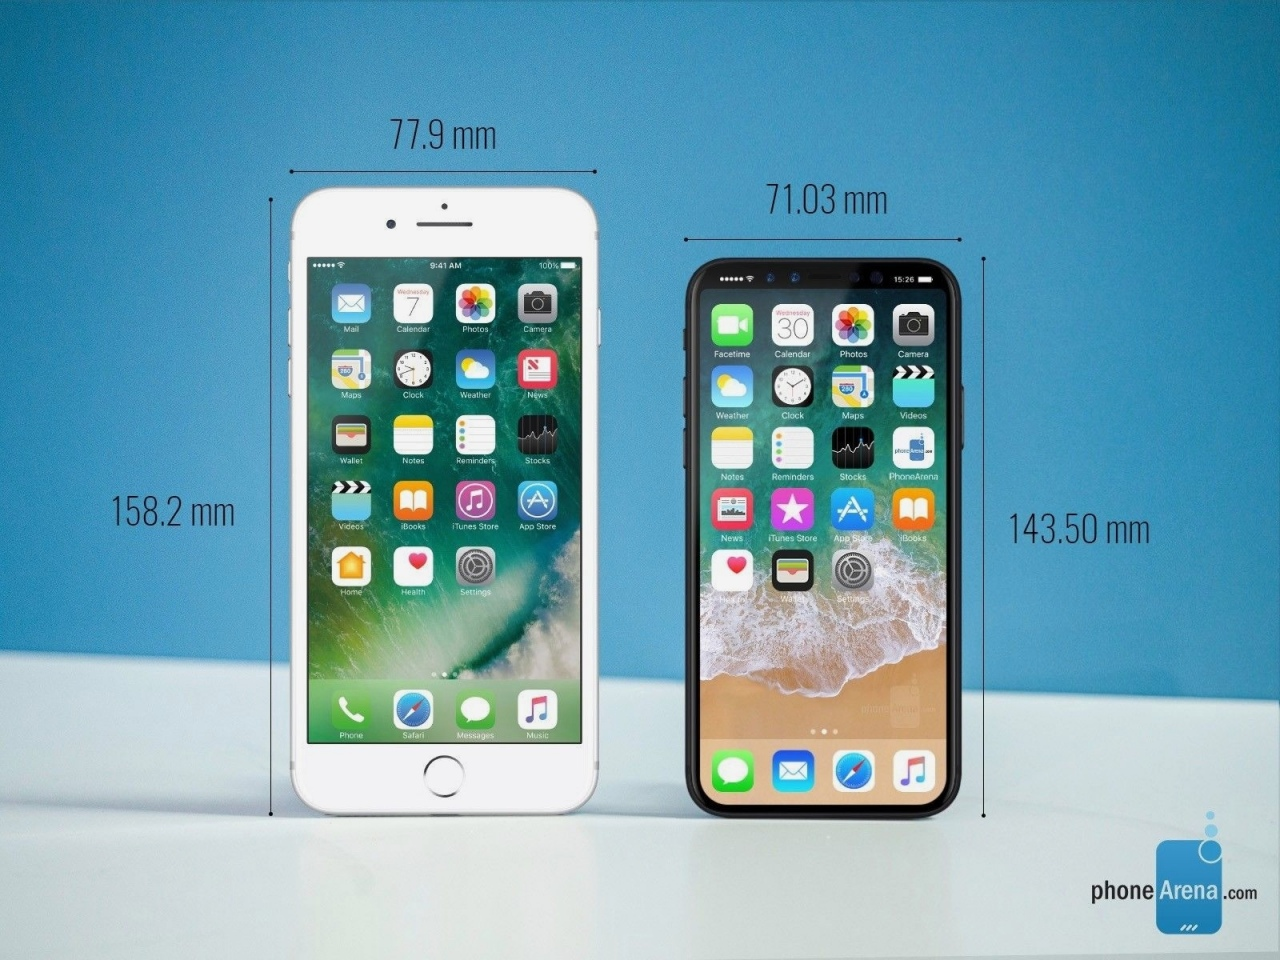 Samsung J7 Pro J7 Wallpaper Now Download Wallpaper Iphone Plus 8 Vs Iphone 6 Size 28067 Hd Wallpaper Backgrounds Download